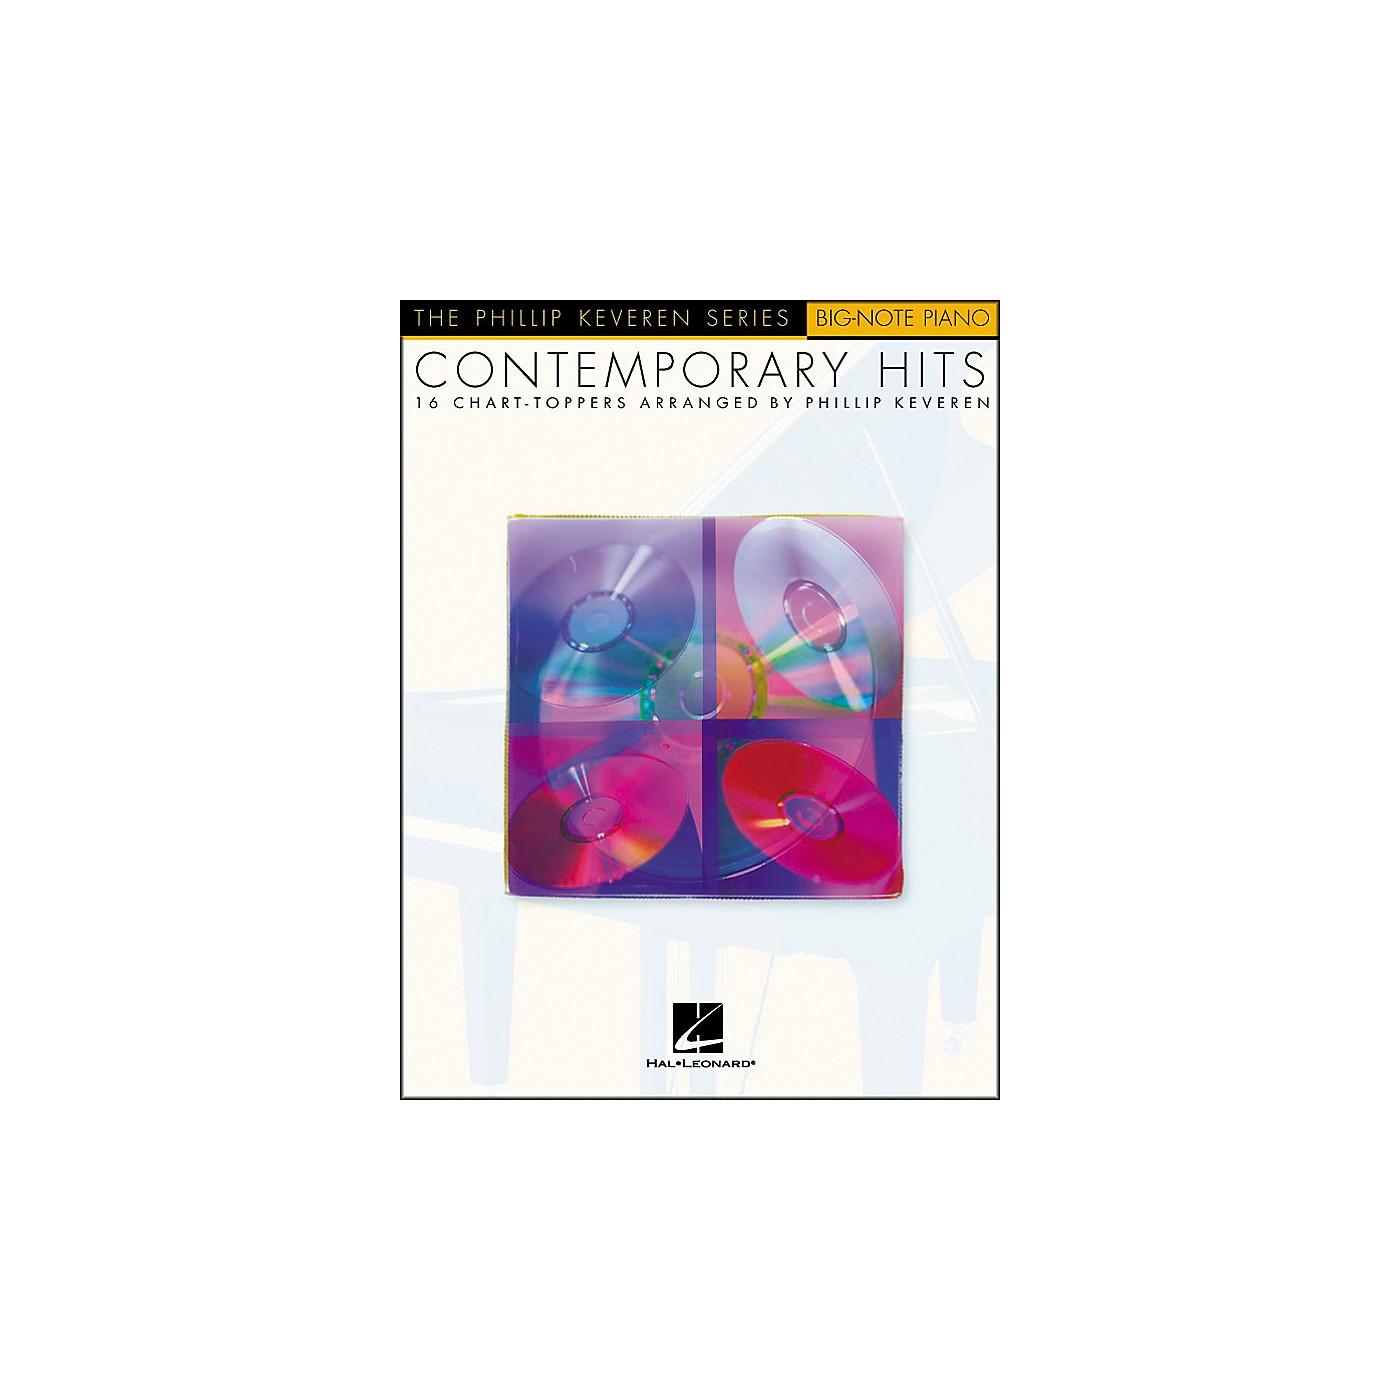 Hal Leonard Contemporary Hits - Phillip Keveren Series for Big Note Piano thumbnail